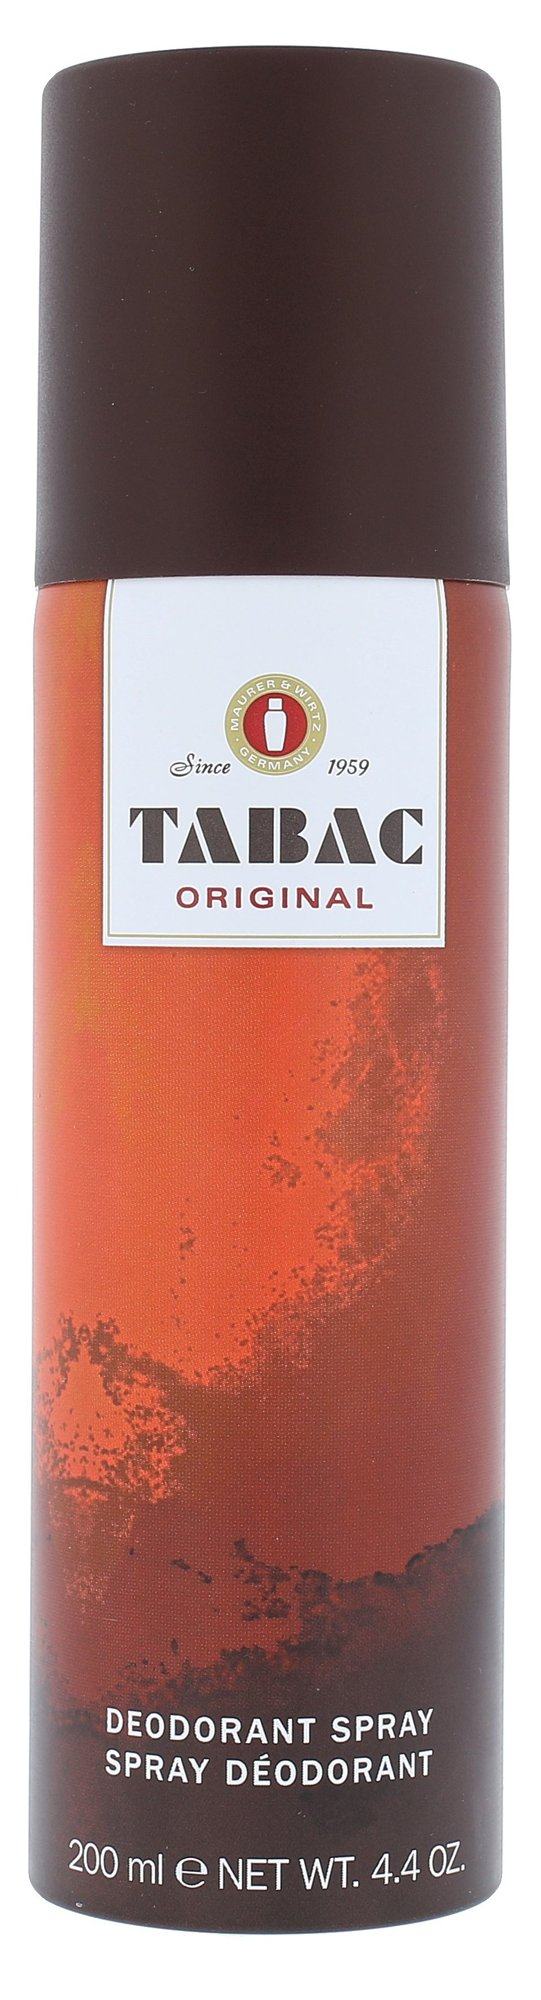 Tabac Original Deodorant 200ml